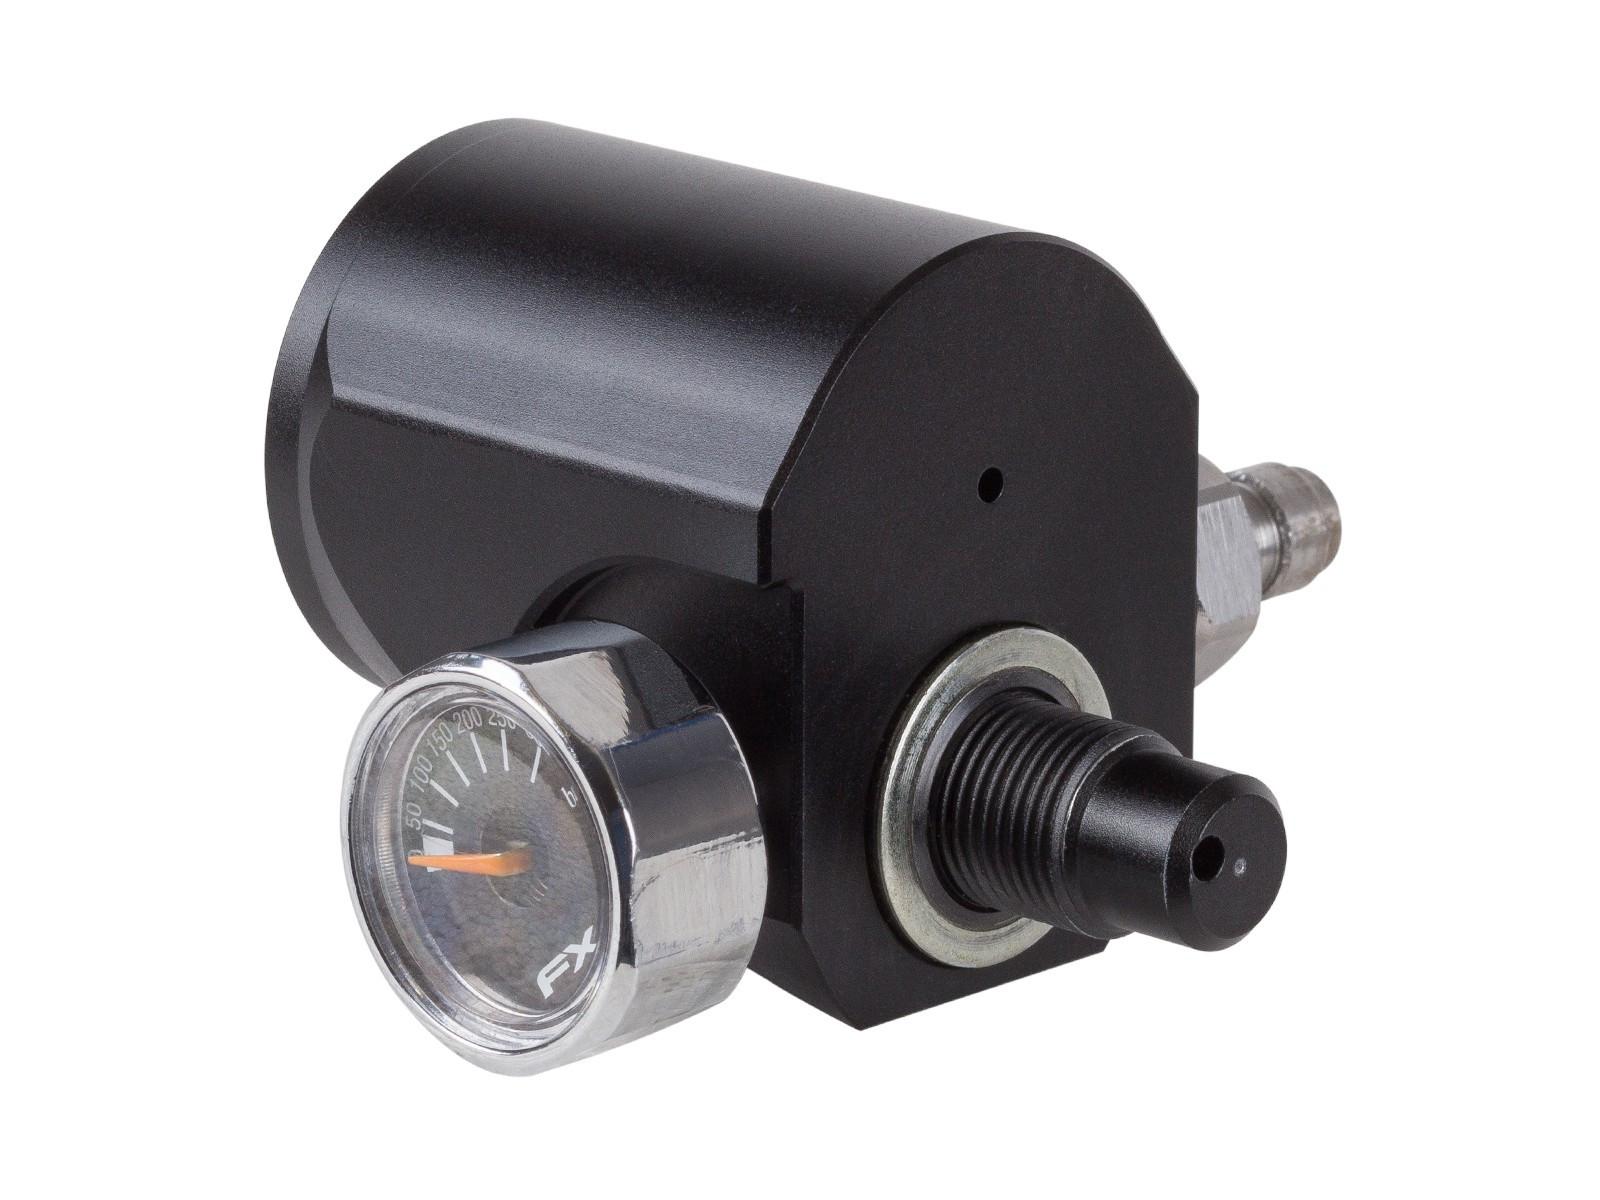 FX Dream-Lite/Dream-Tac Bottle Adapter